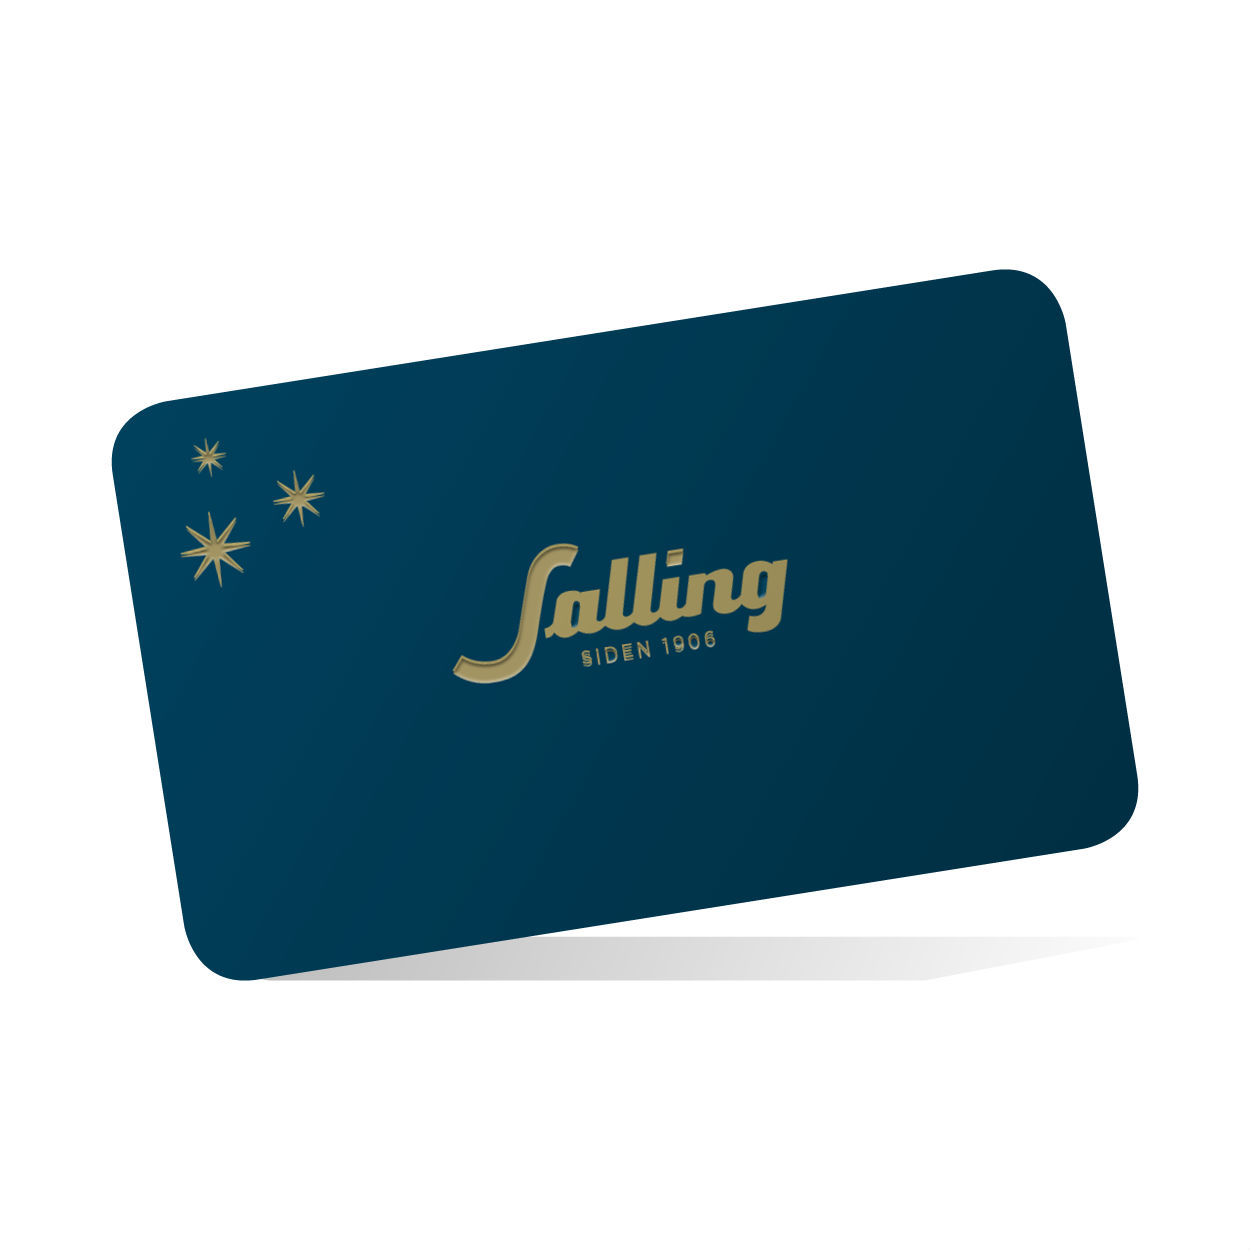 Salling gavekort - 150 kr